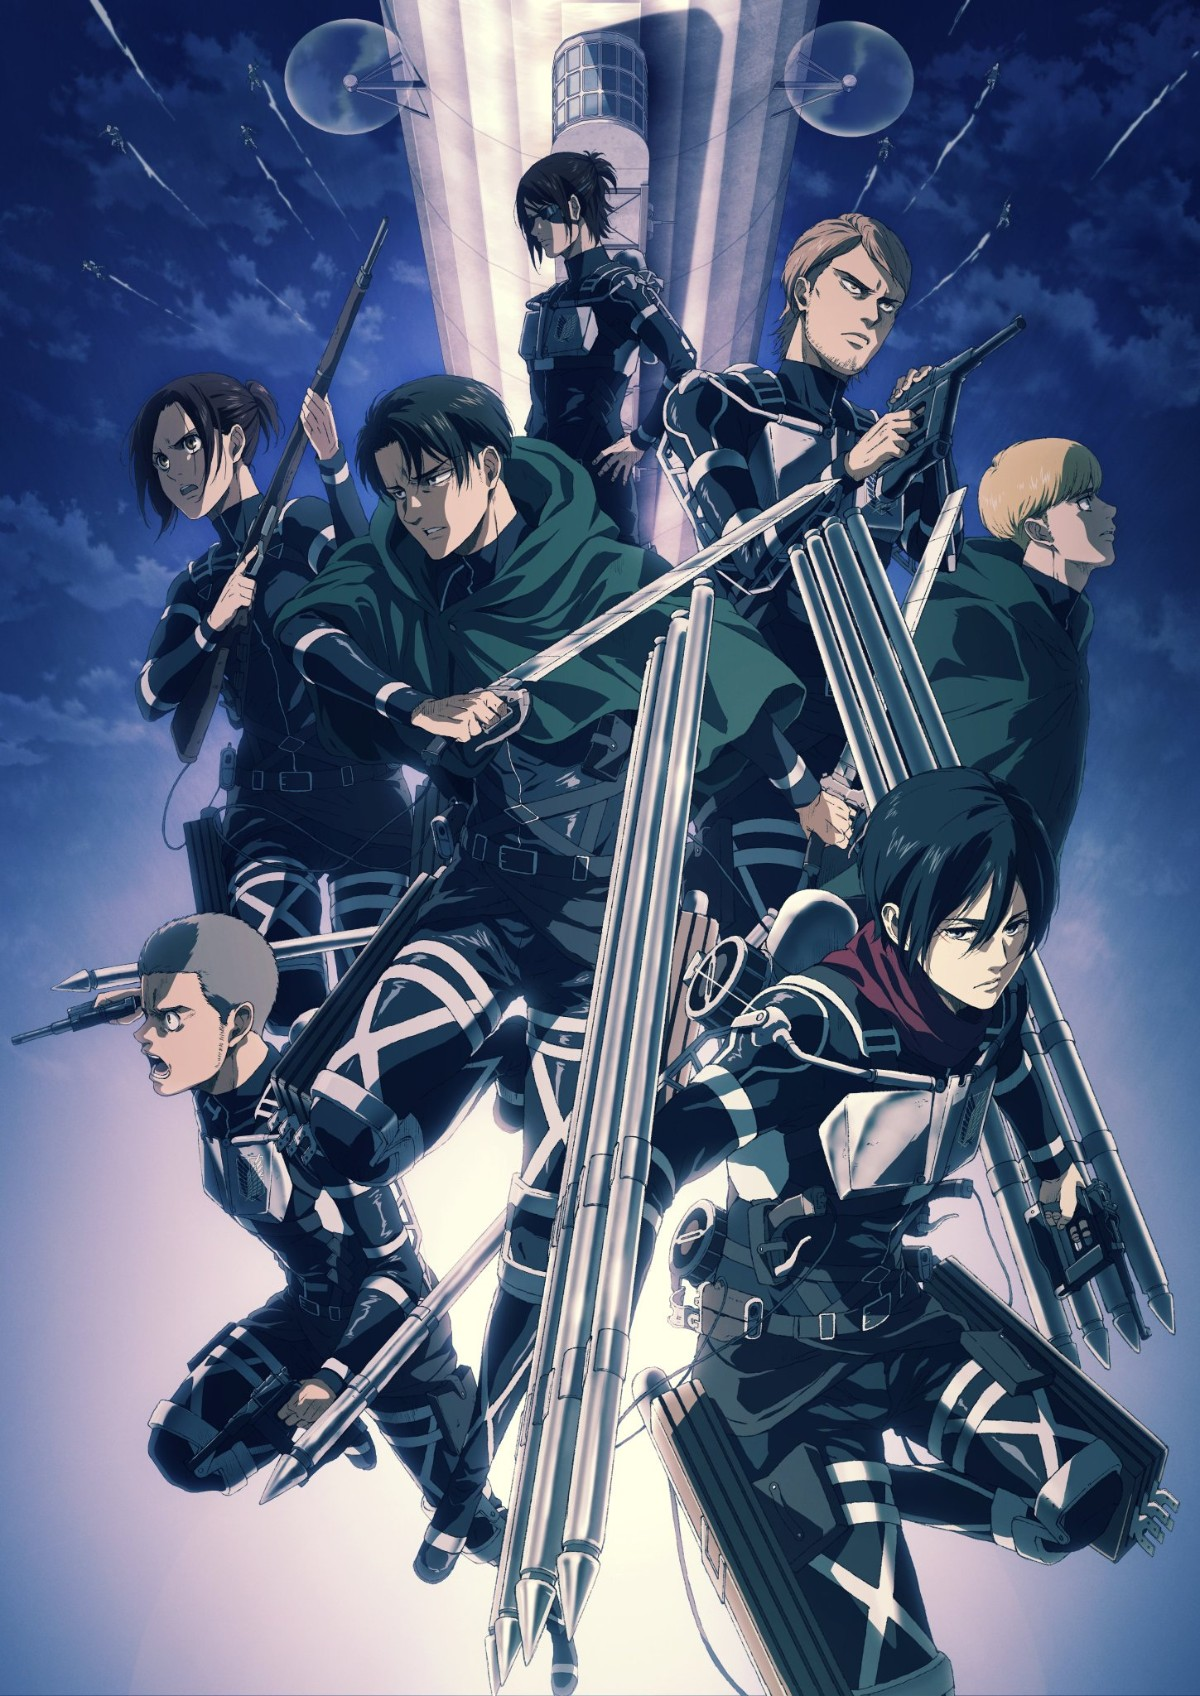 Attack On Titan Season 4 Part 2 release date in 2021? Netflix Japan teases 2-part Shingeki no ...